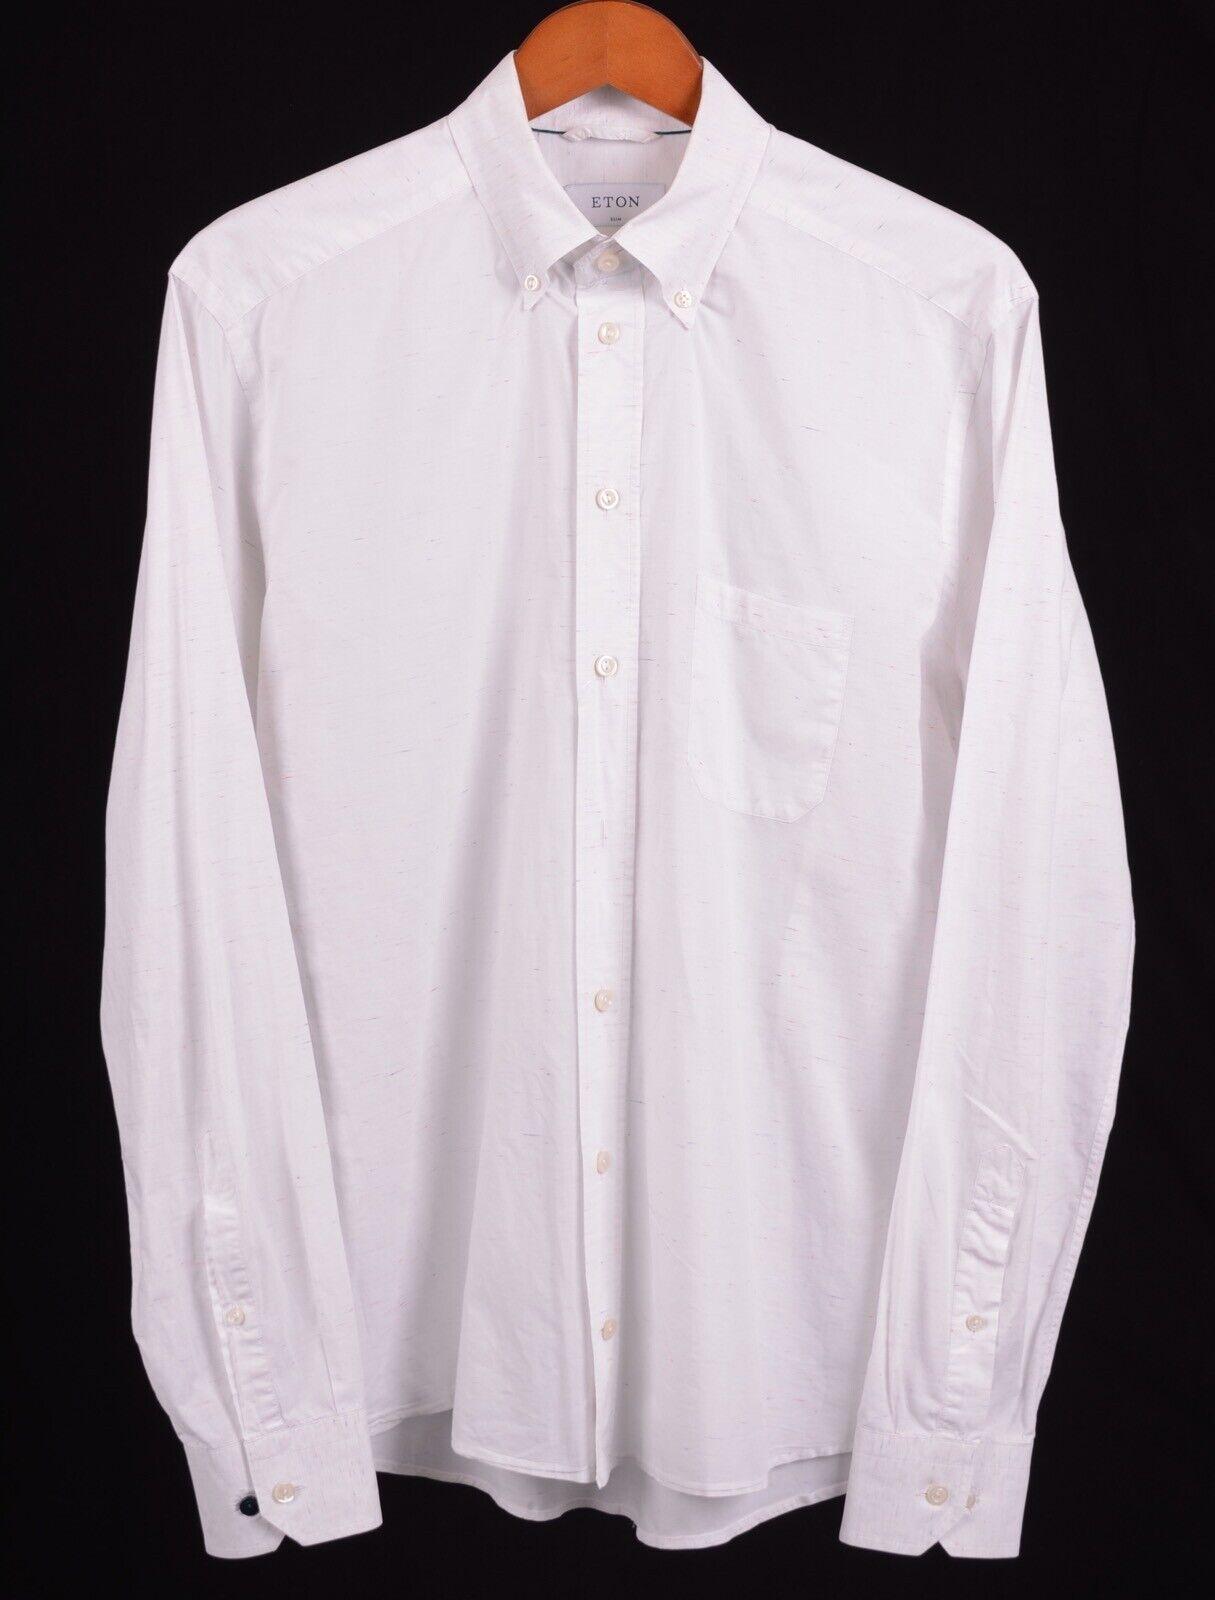 Eton SLIM White Rainbow Nep Cotton Lightweight Button Down Casual Dress Shirt L